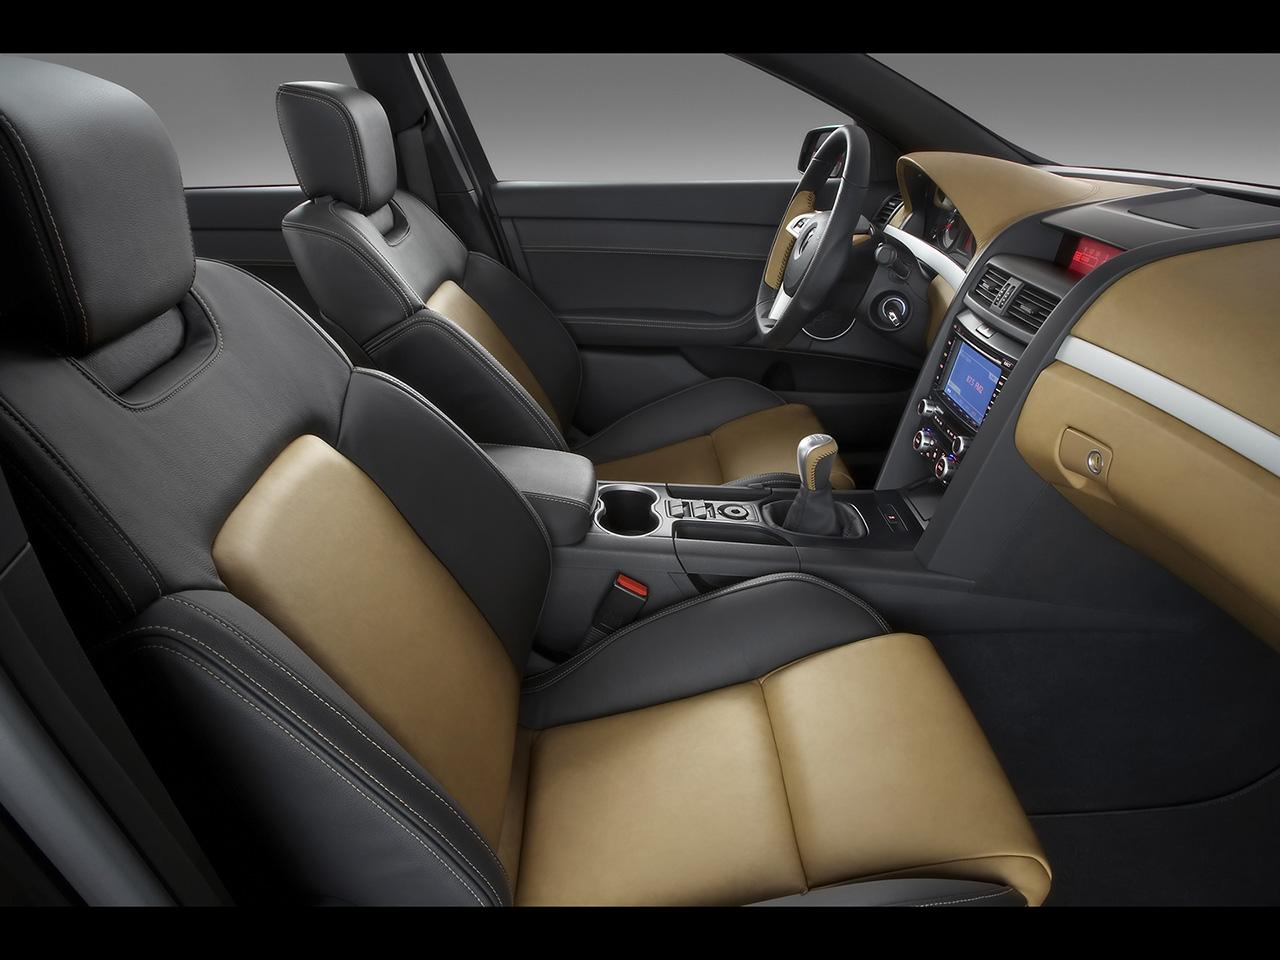 Car Interior Pictures Wallpaper 1280x960 75800